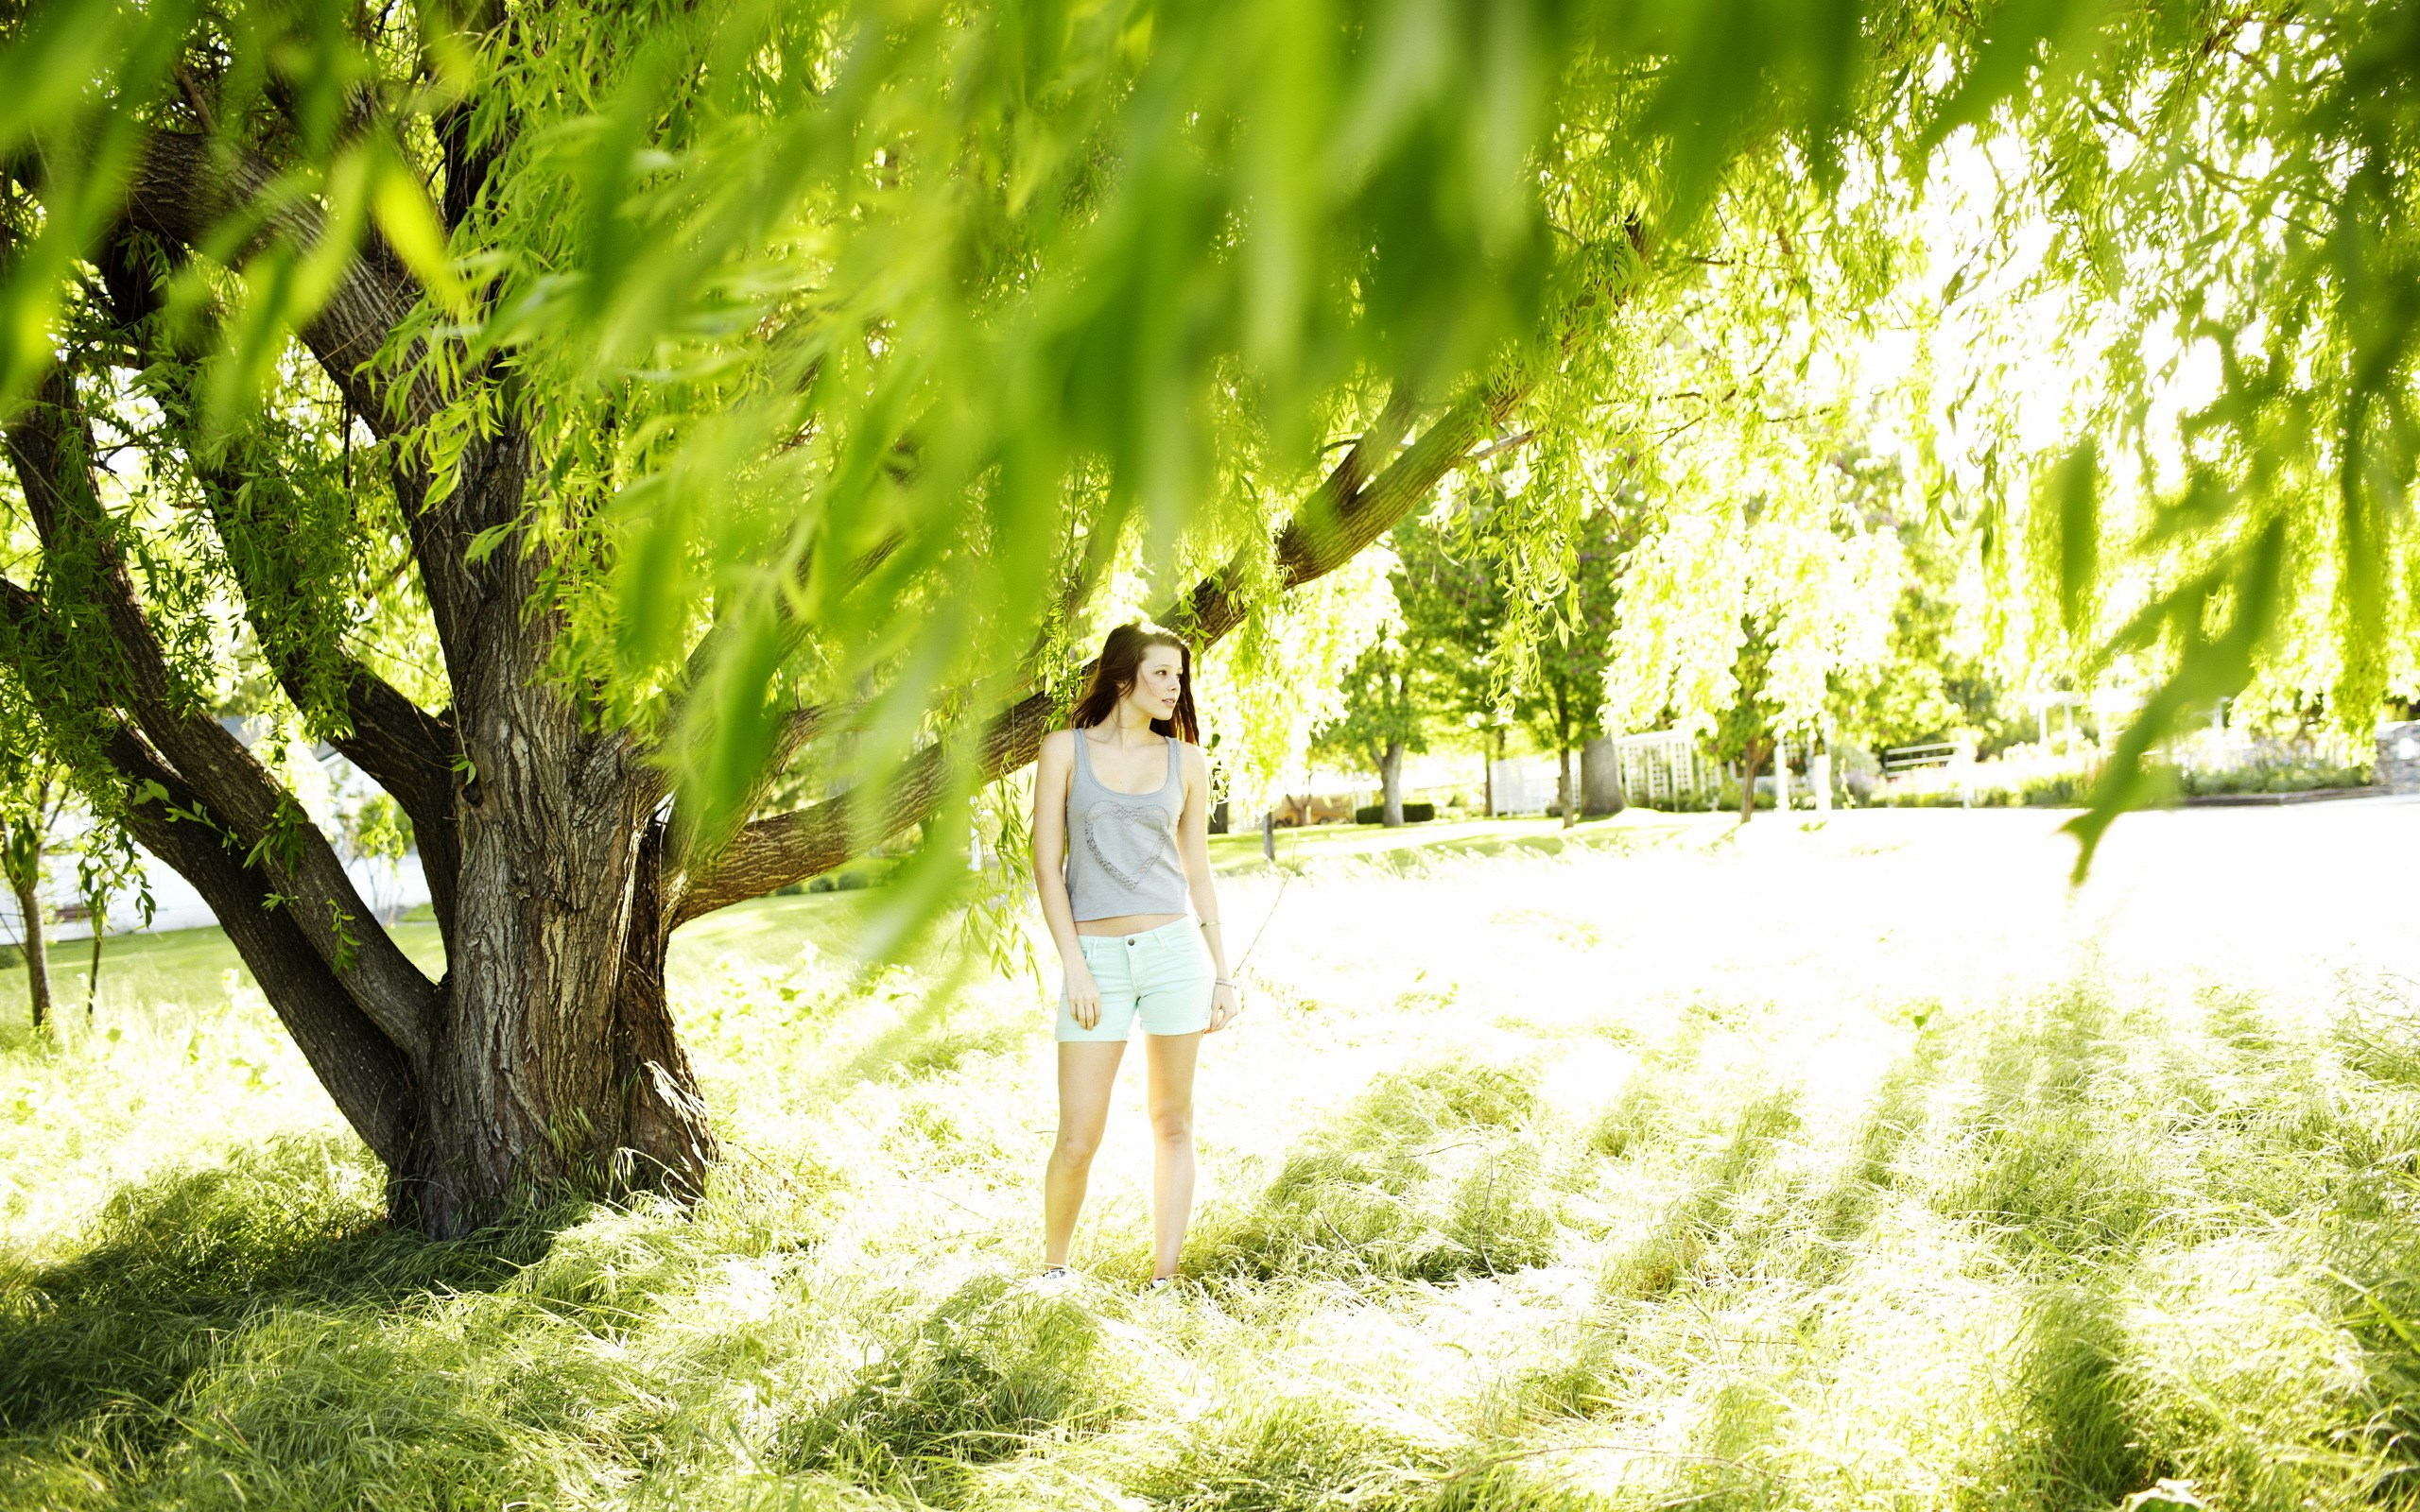 Girl Summer Tree Nature